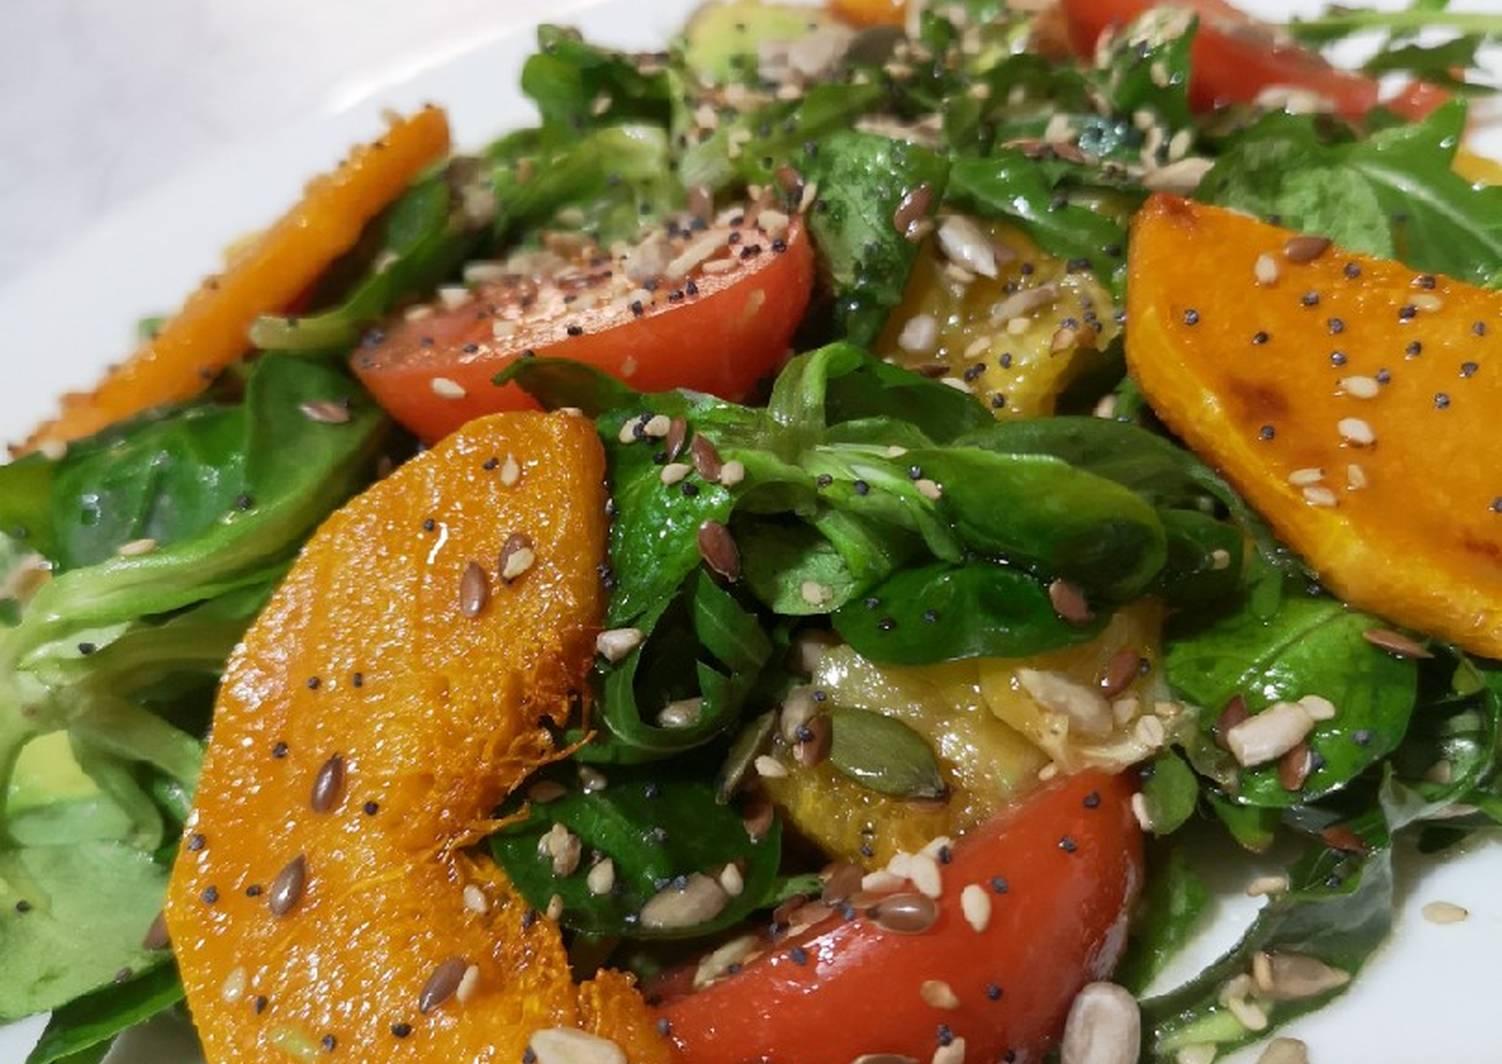 салаты весенние рецепты с фото онлайн